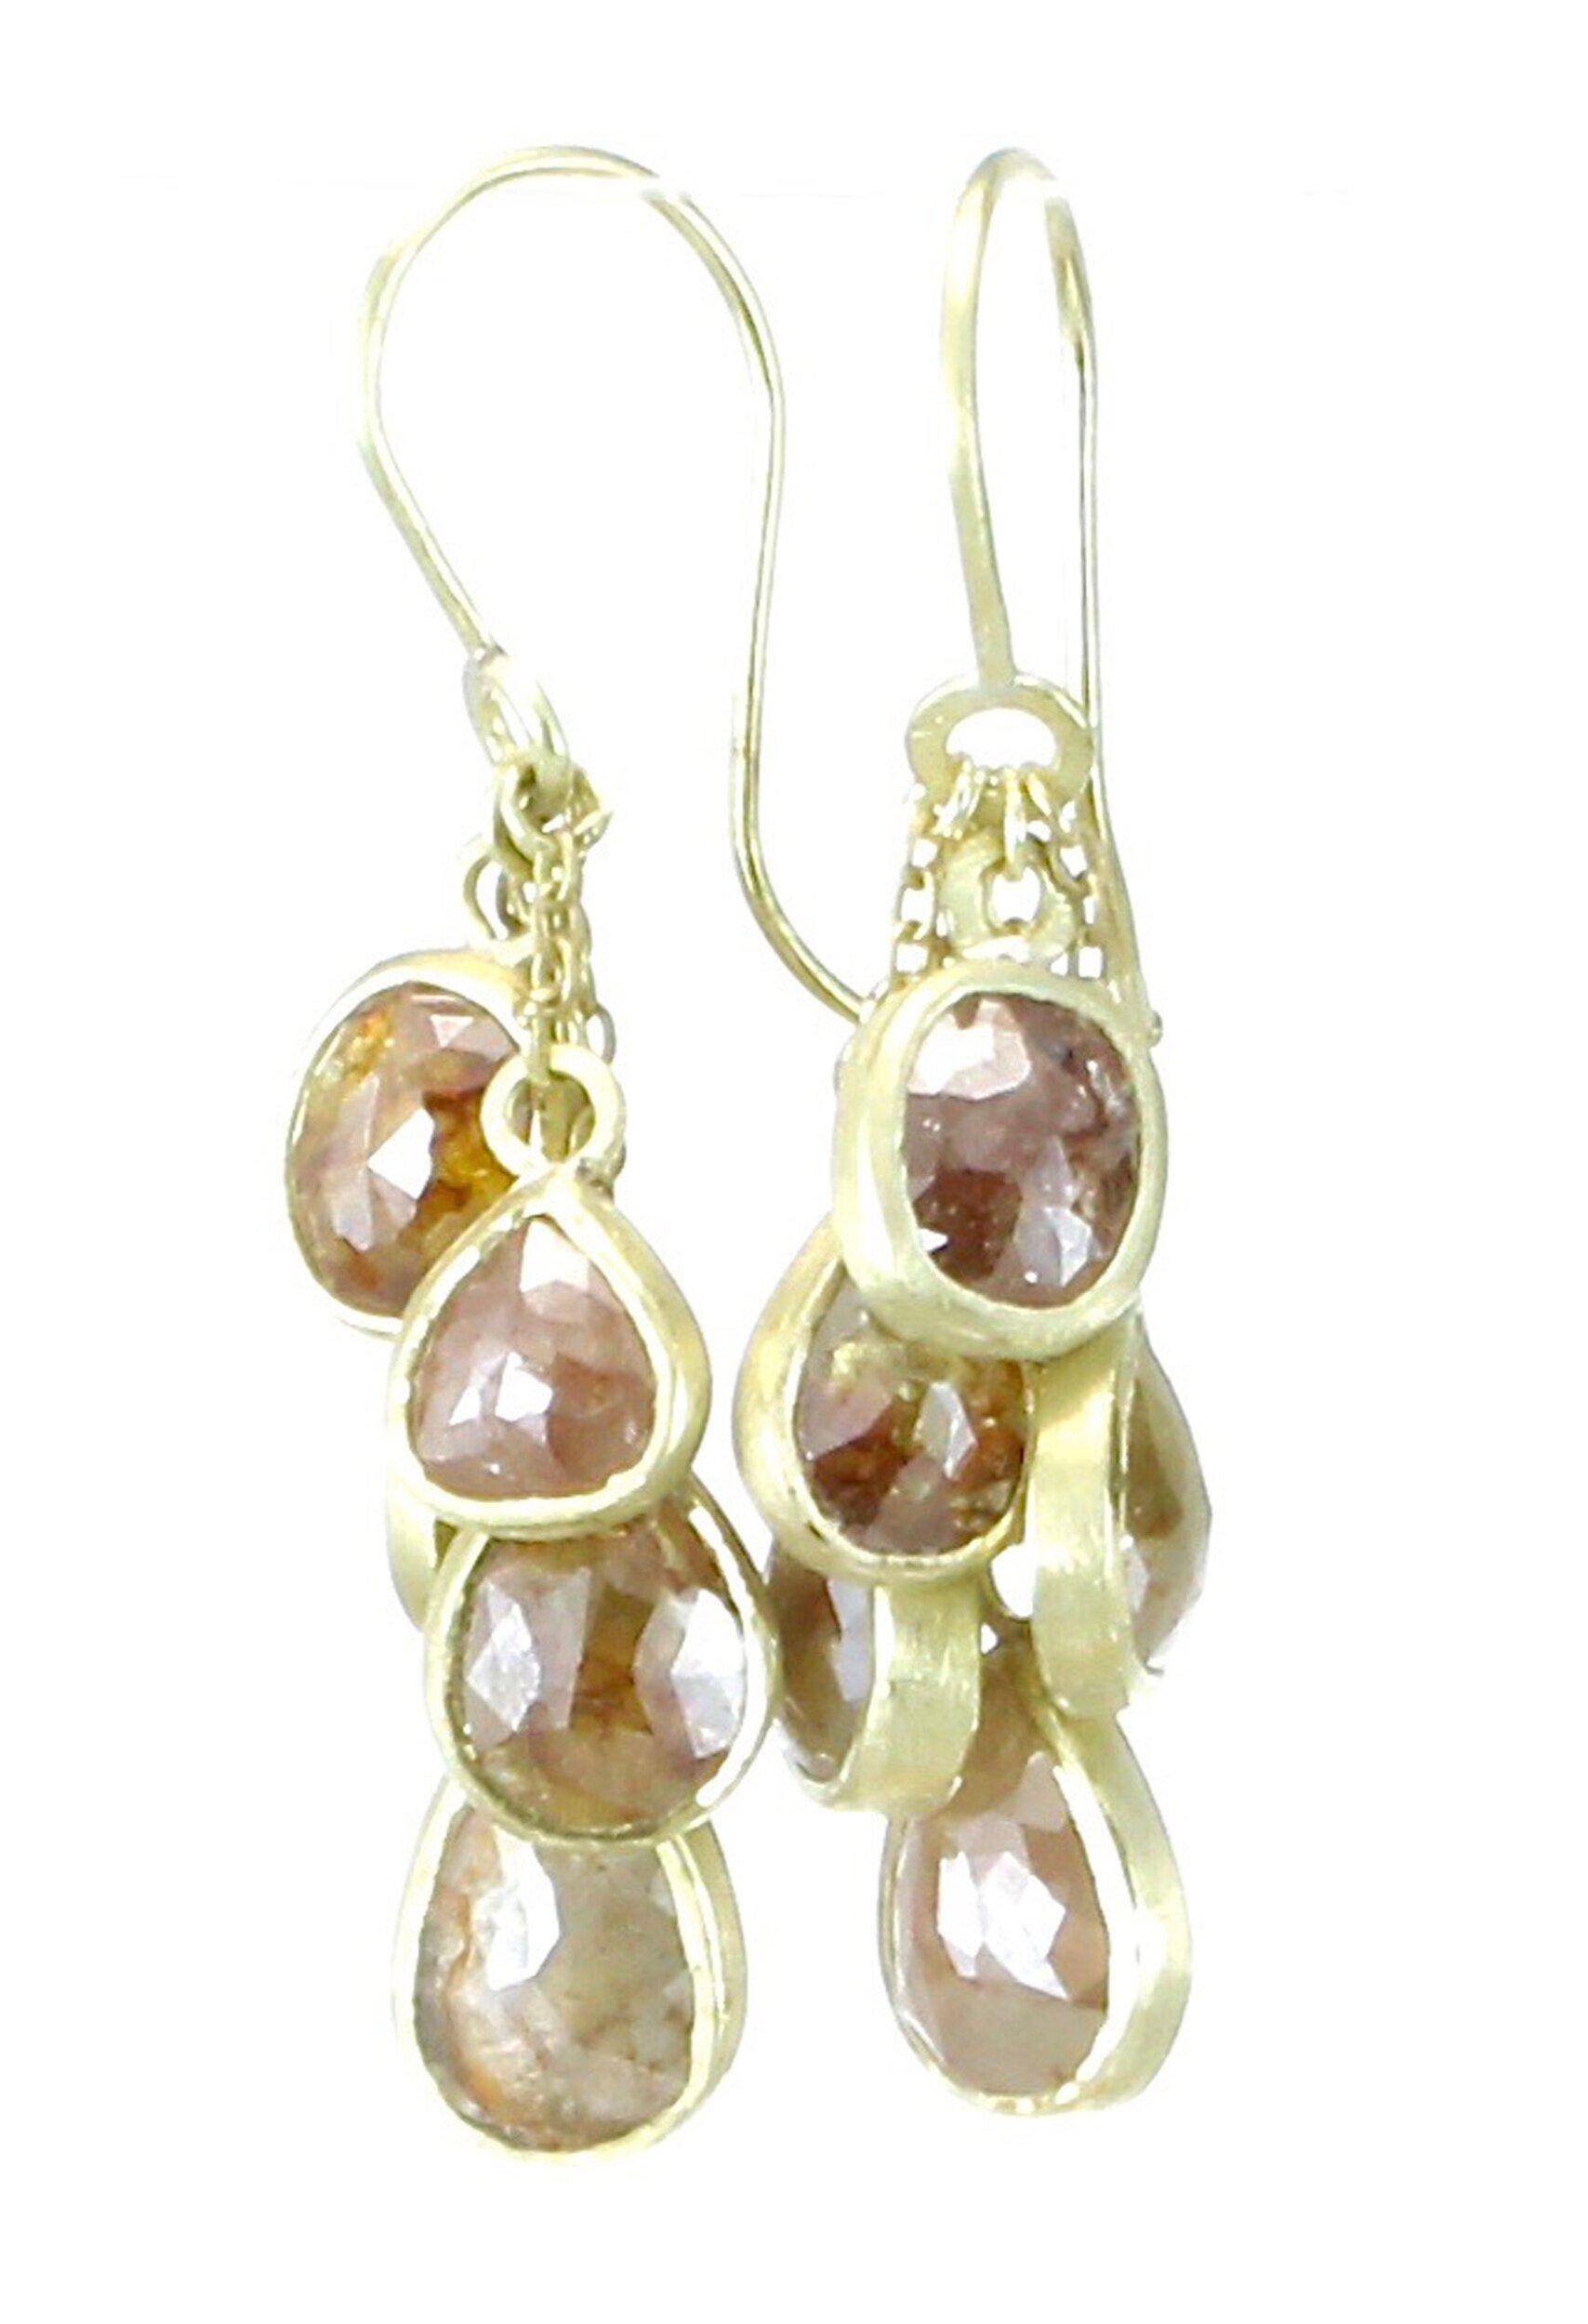 10 diamond dangle earrings with 18k gold